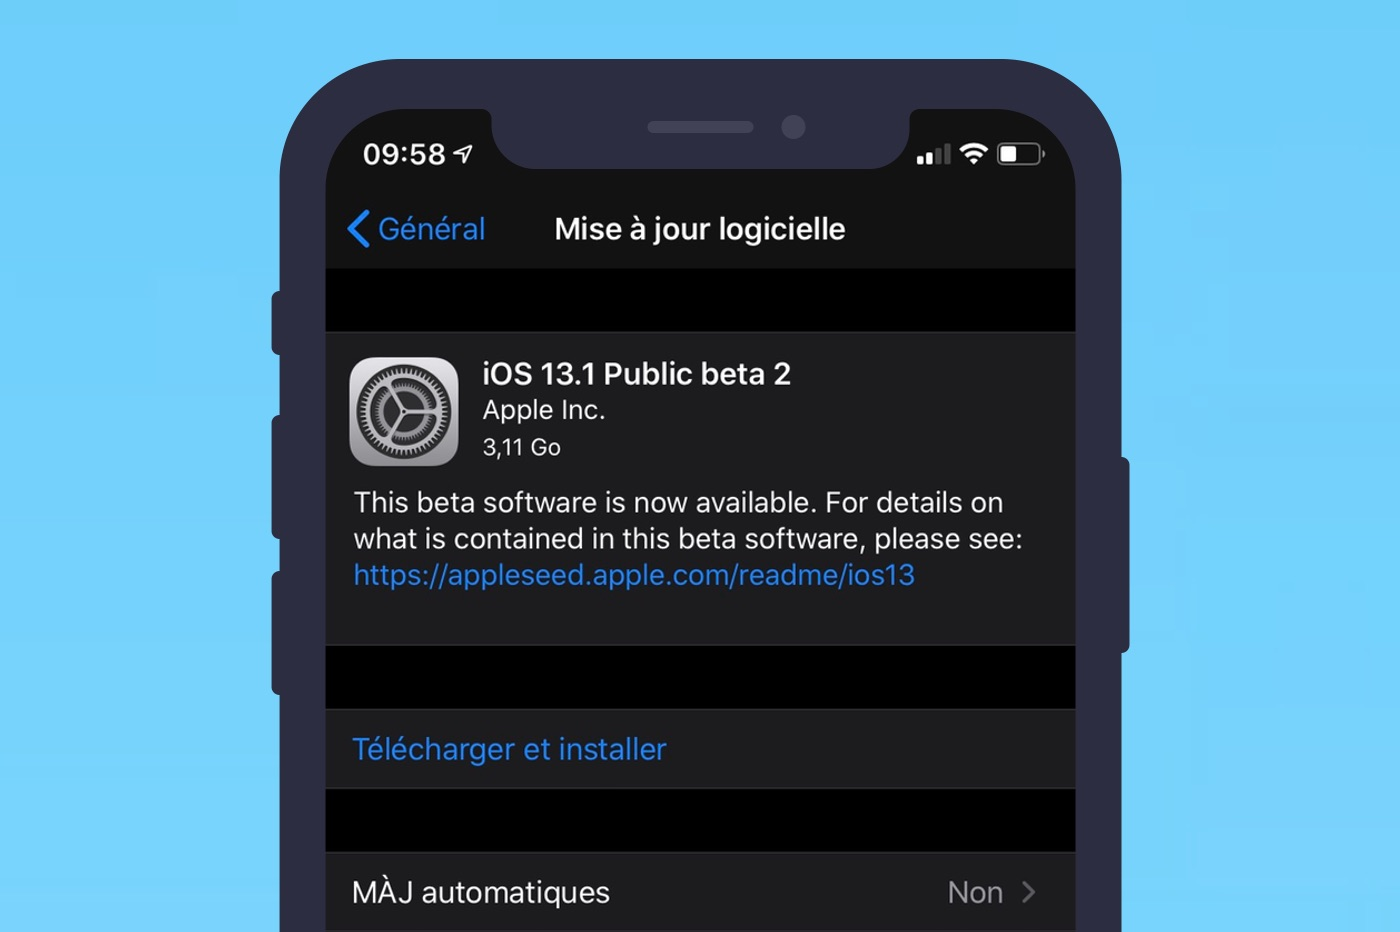 iOS 13.1 bêta 2 est disponible